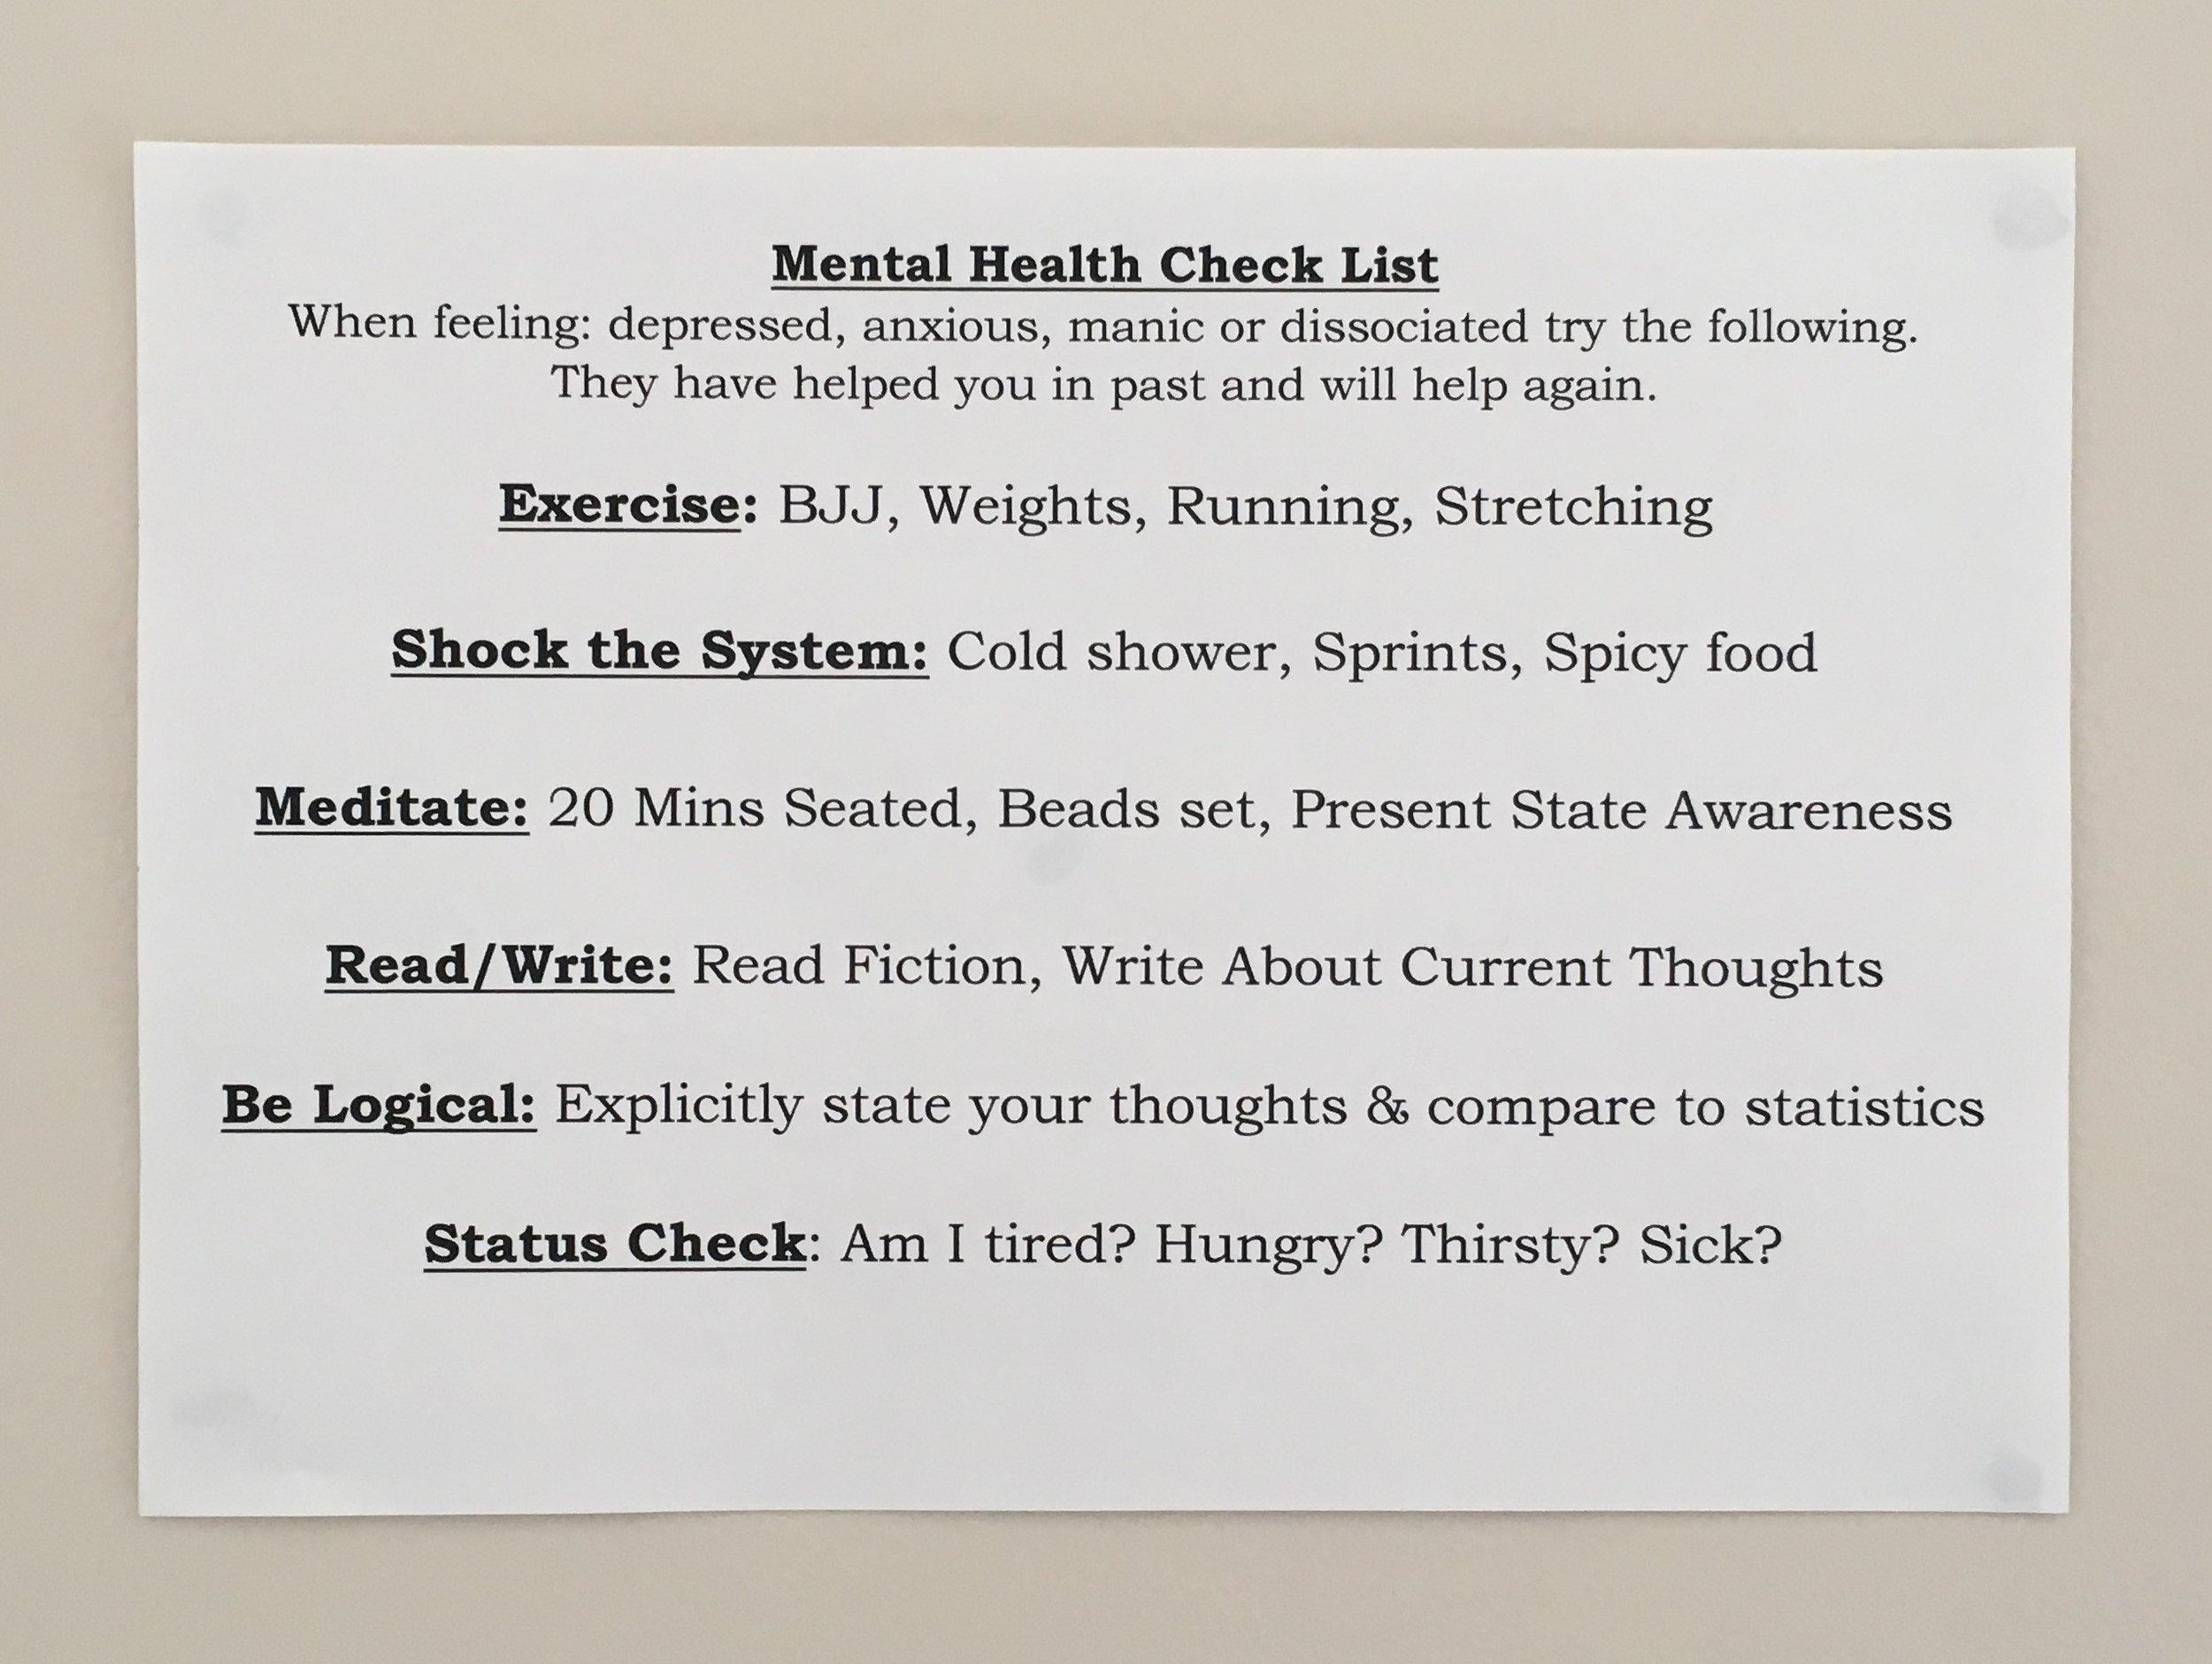 menatl health checklist